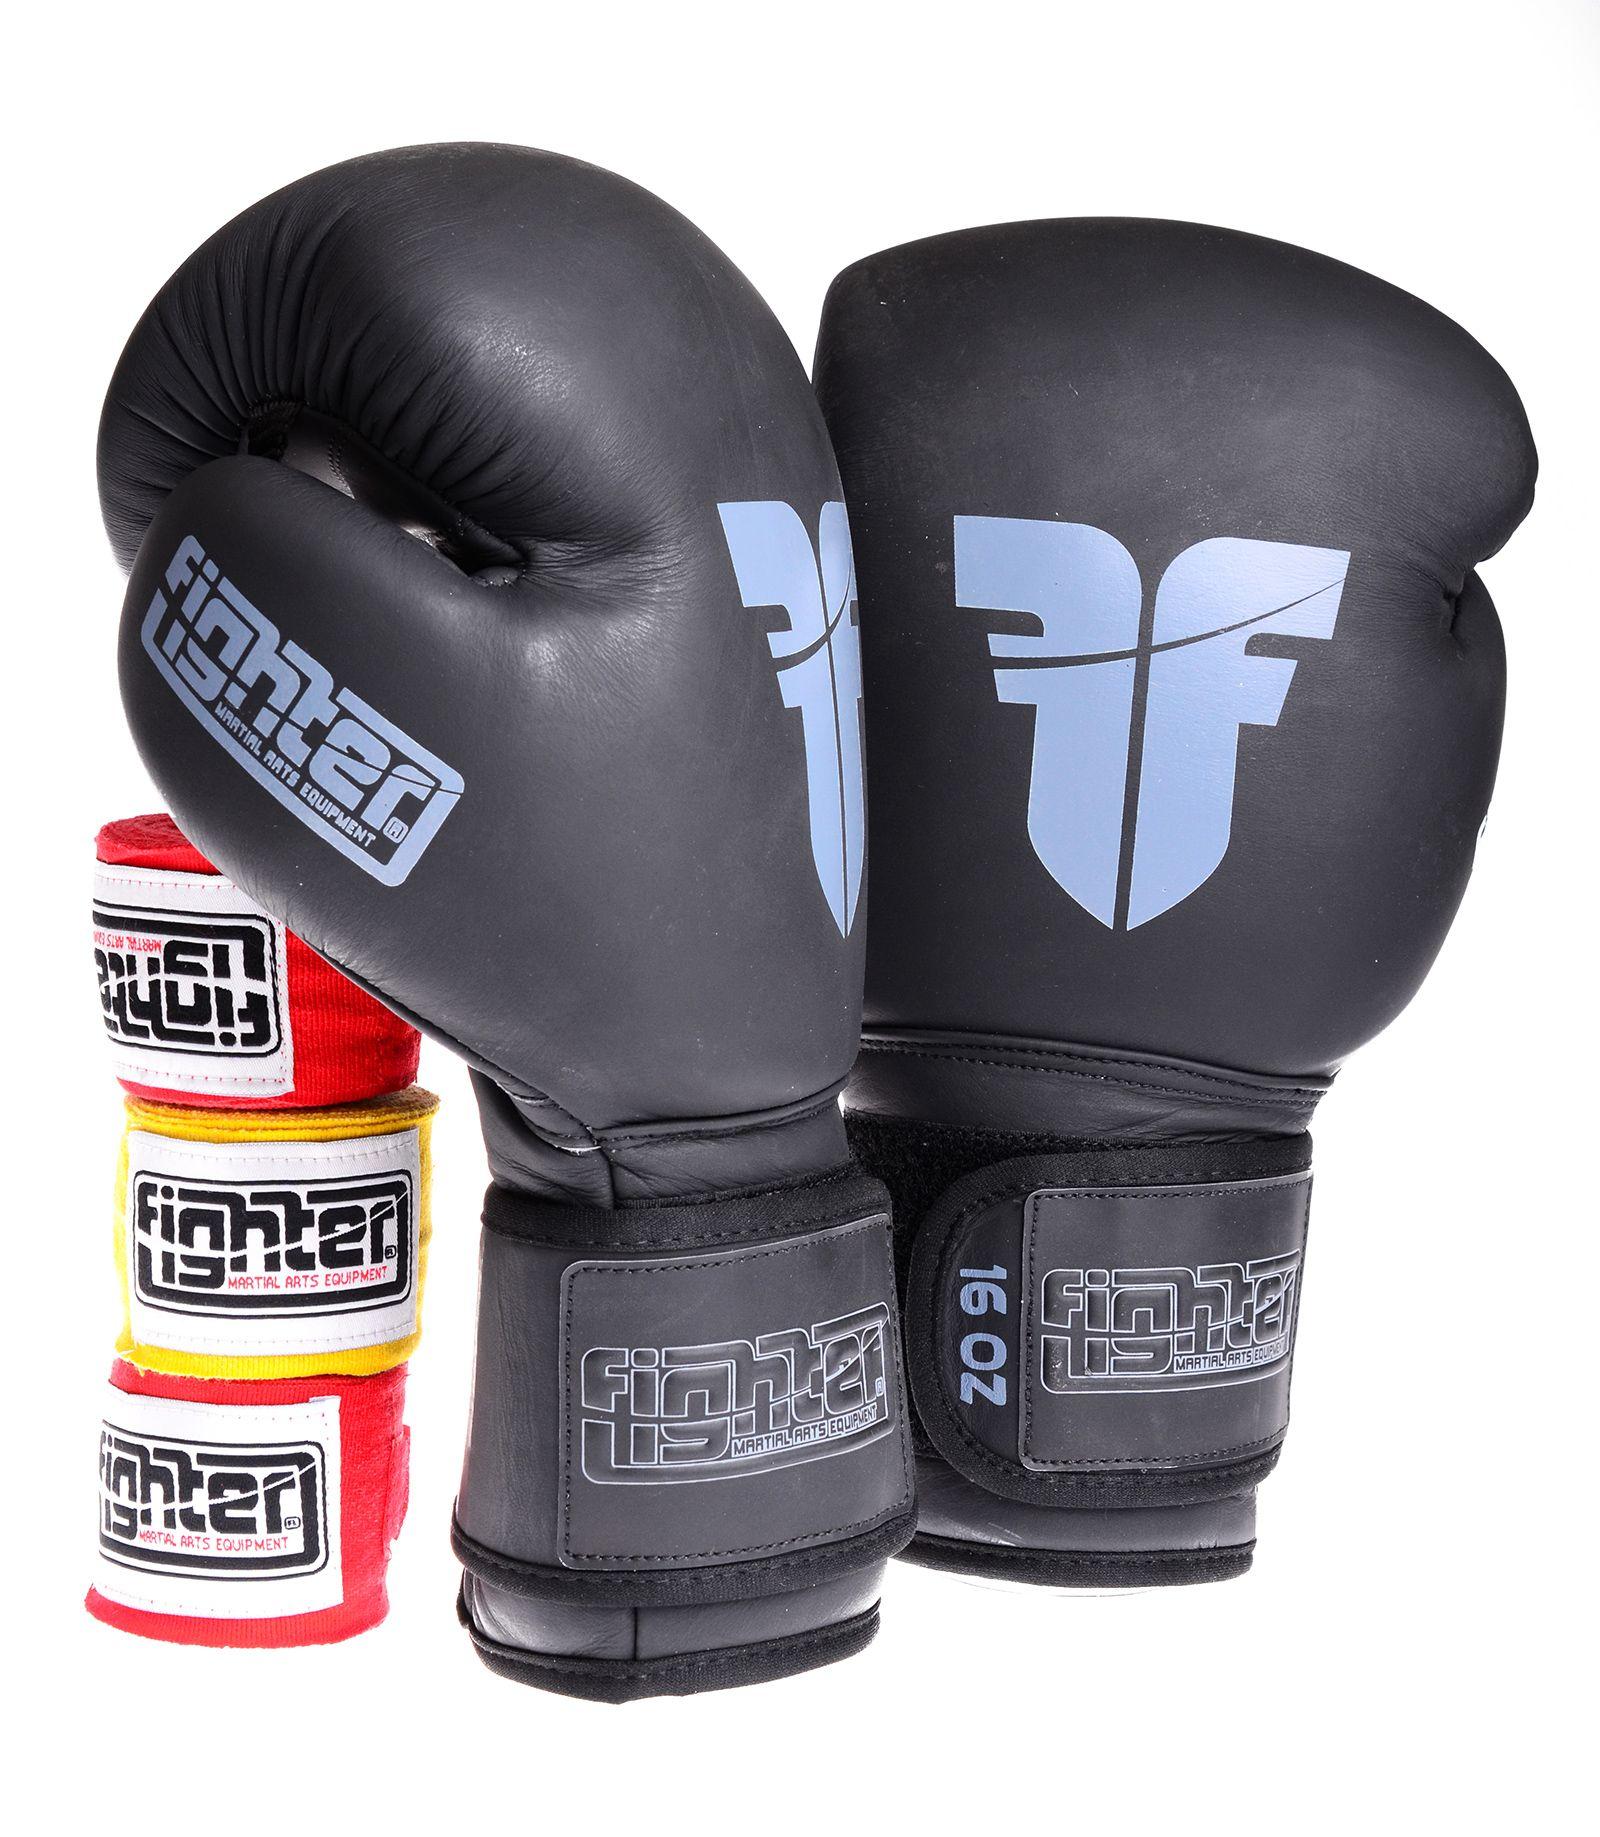 Black Boxing Punching Gloves 16 Oz